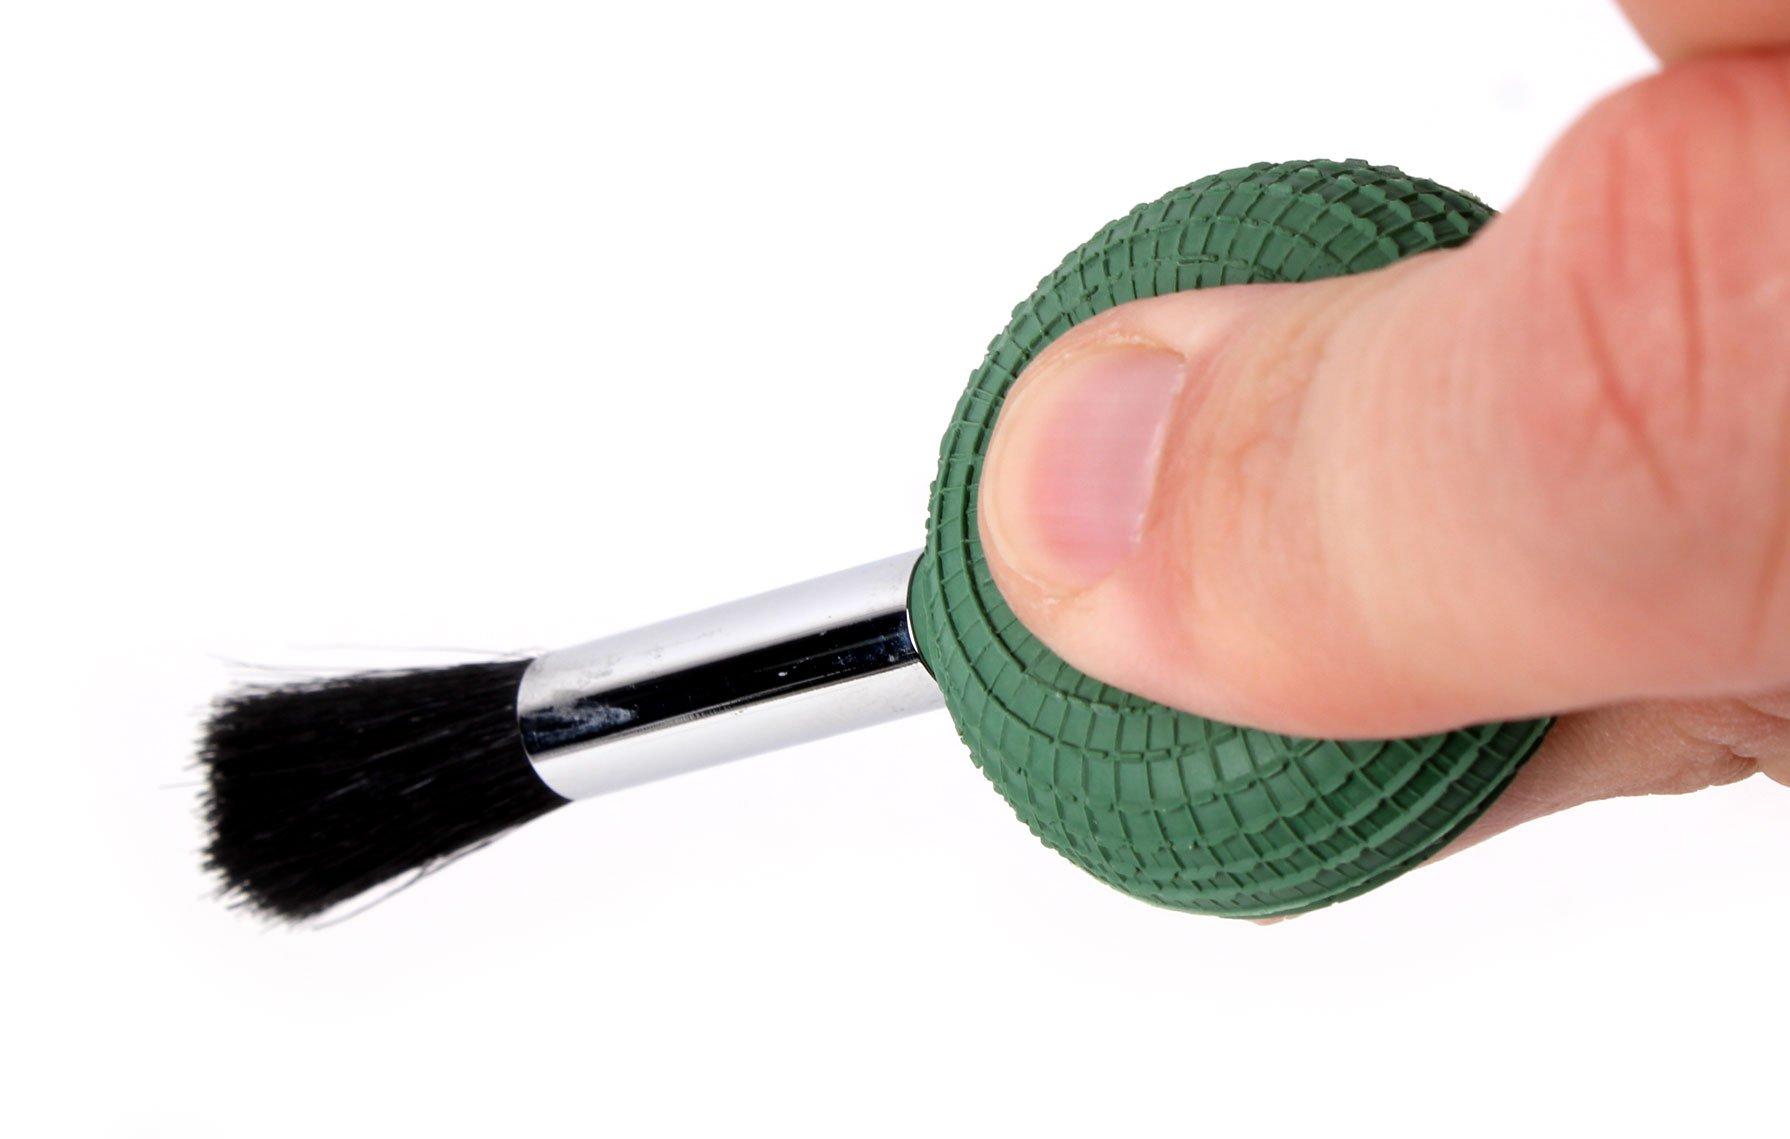 DURAGADGET Camera Lens Blower Brush Cleaning Pen for Panasonic DMC-G6KEB-K/ G6, DMC-GF6KEB-K Lumix G / GF6, Lumix DMC-F5 & Panasonic Lumix LZ20